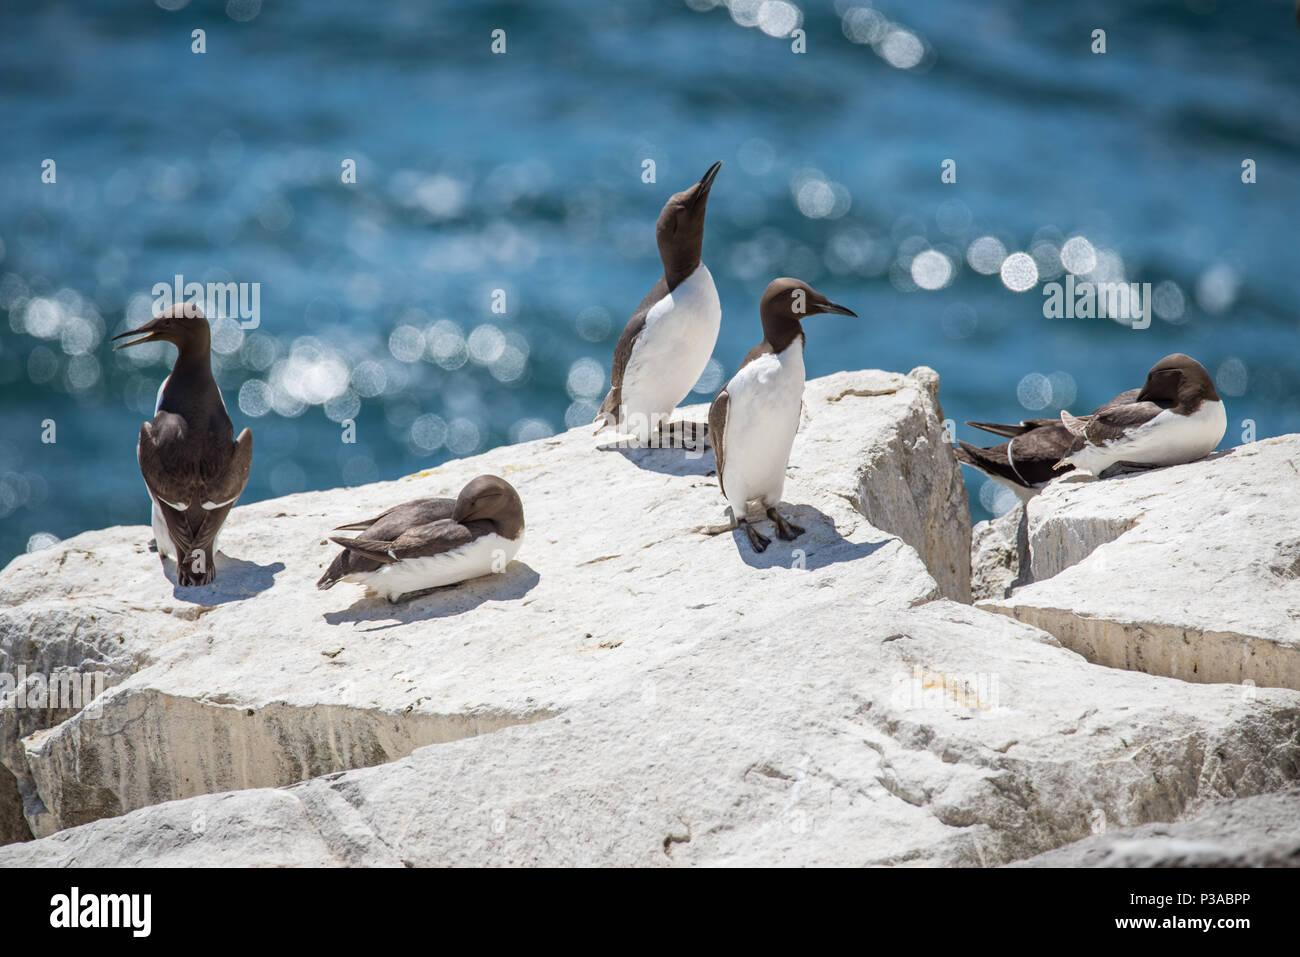 GUILLEMOT seabirds at Saltee Islands in County Wexford - Ireland - Stock Image